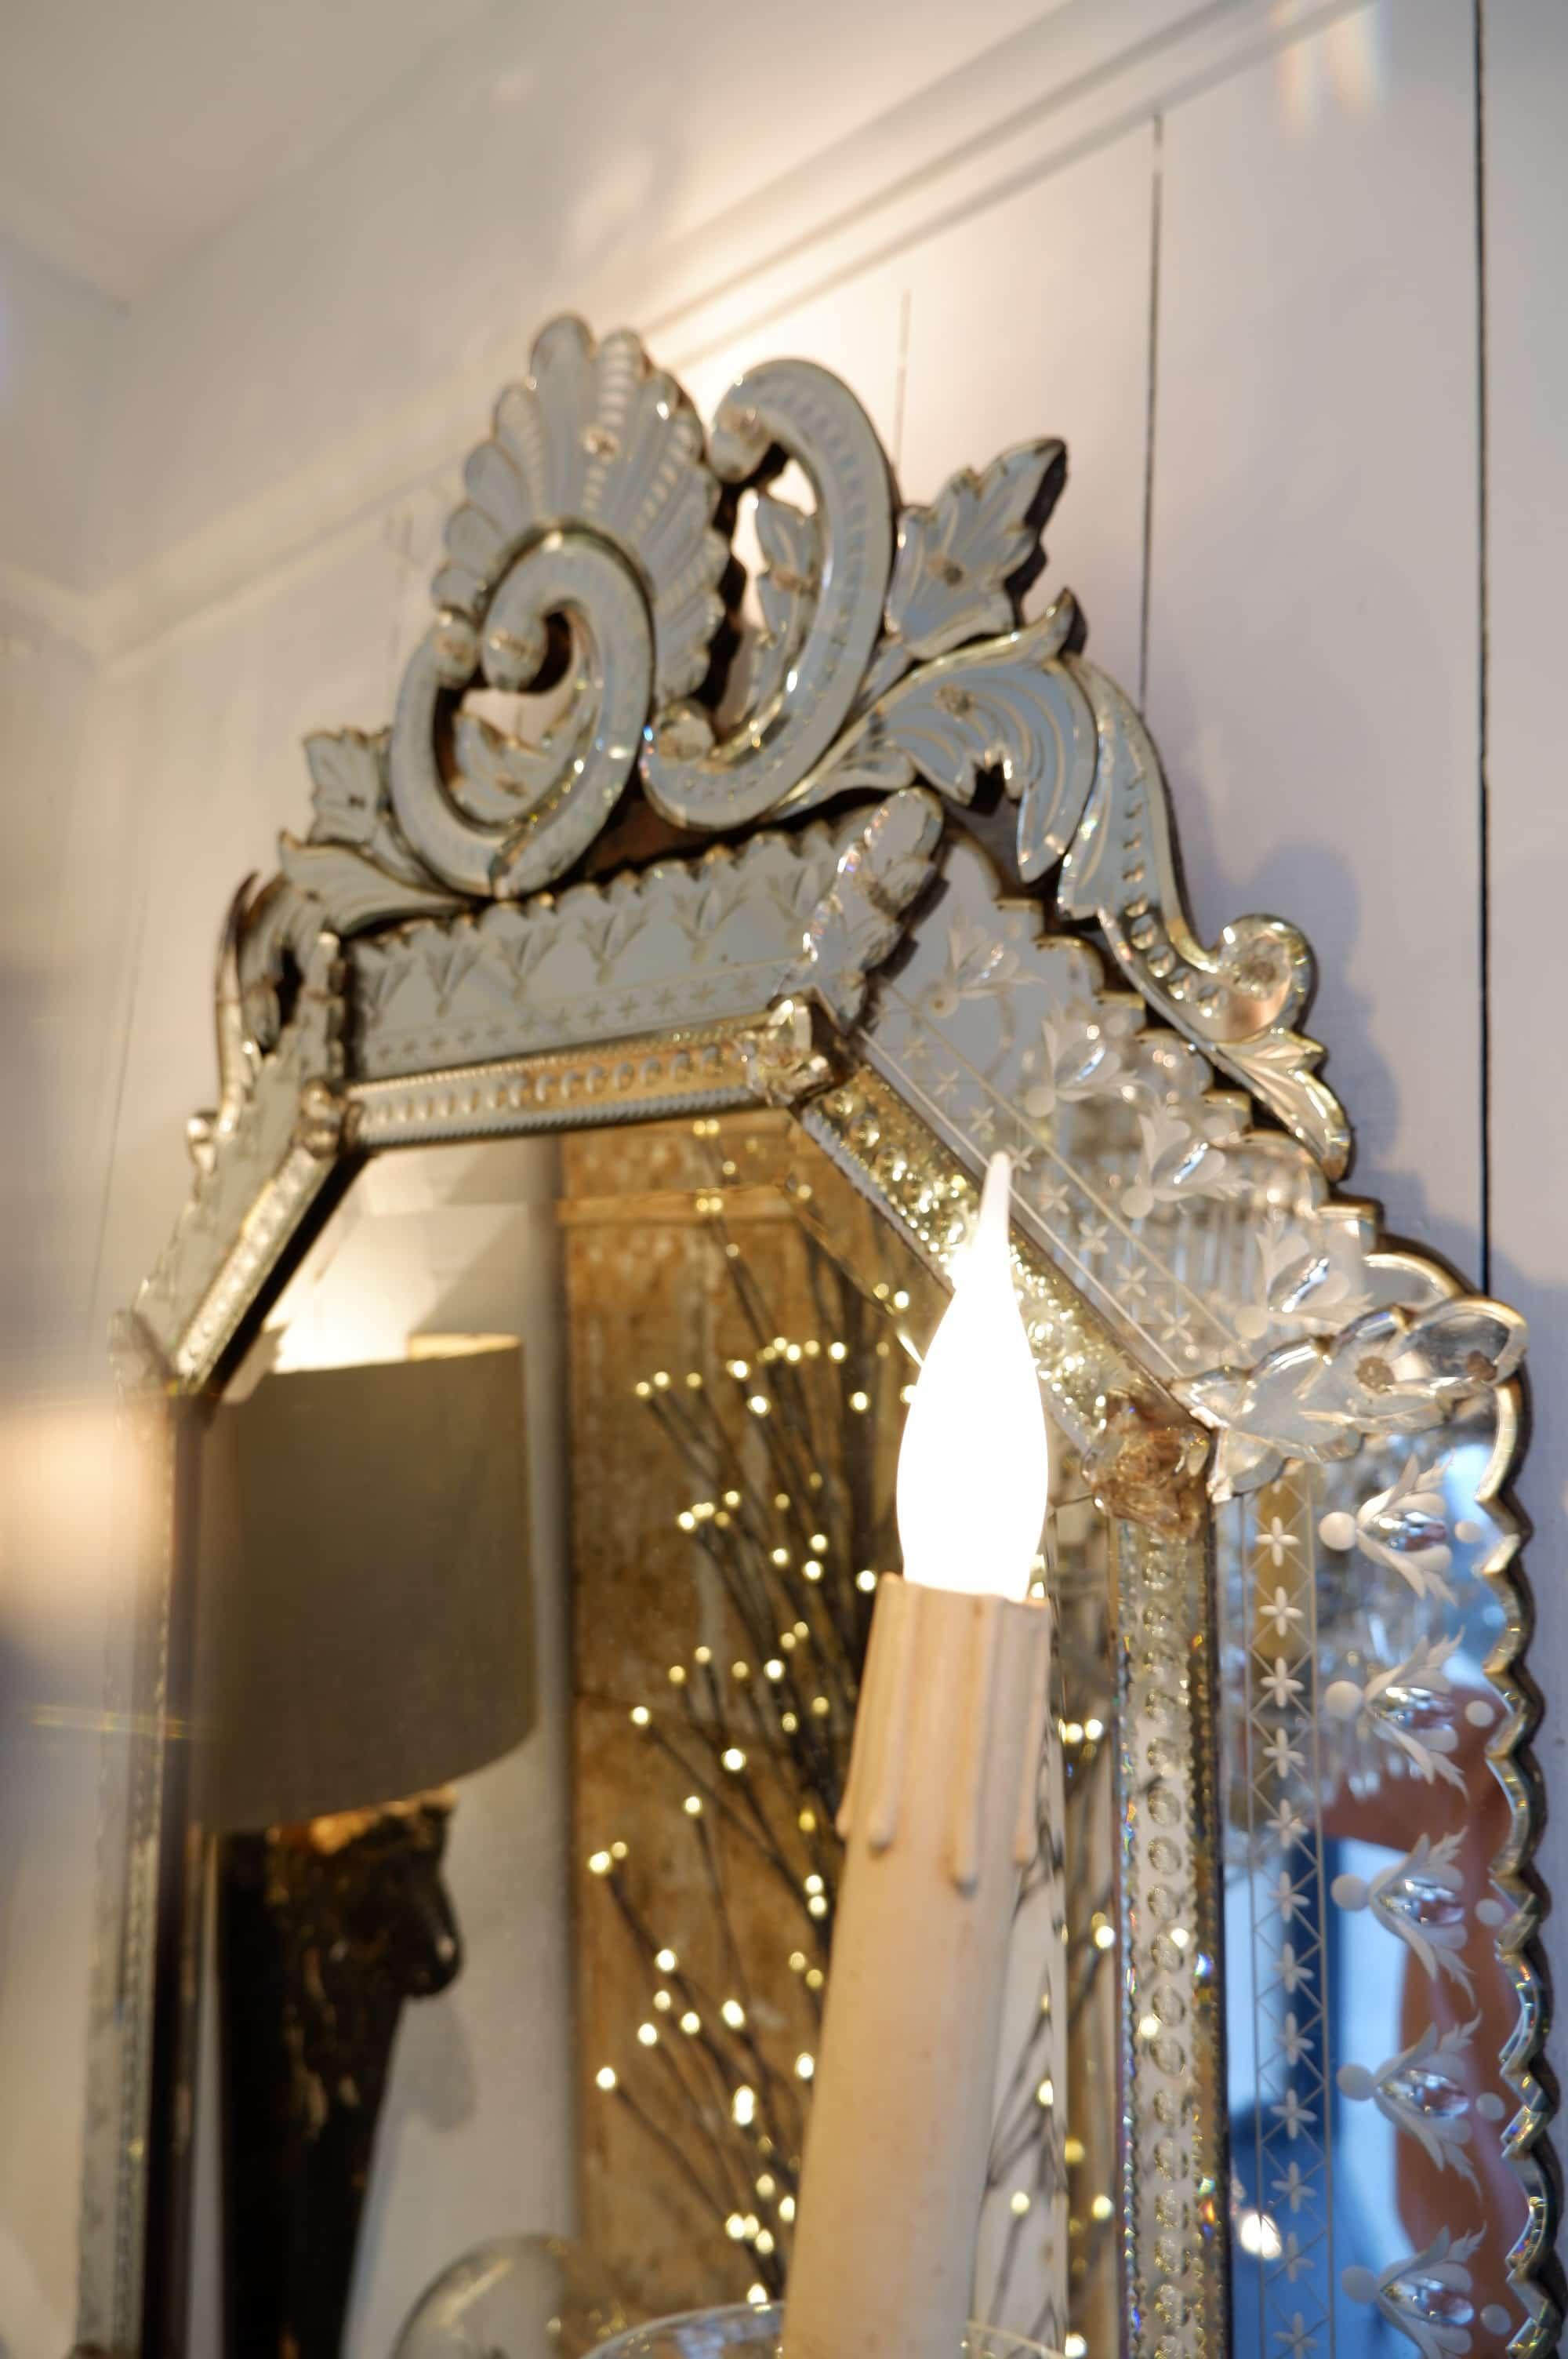 Grand miroir de murano en verre fin XIXe ca.1890